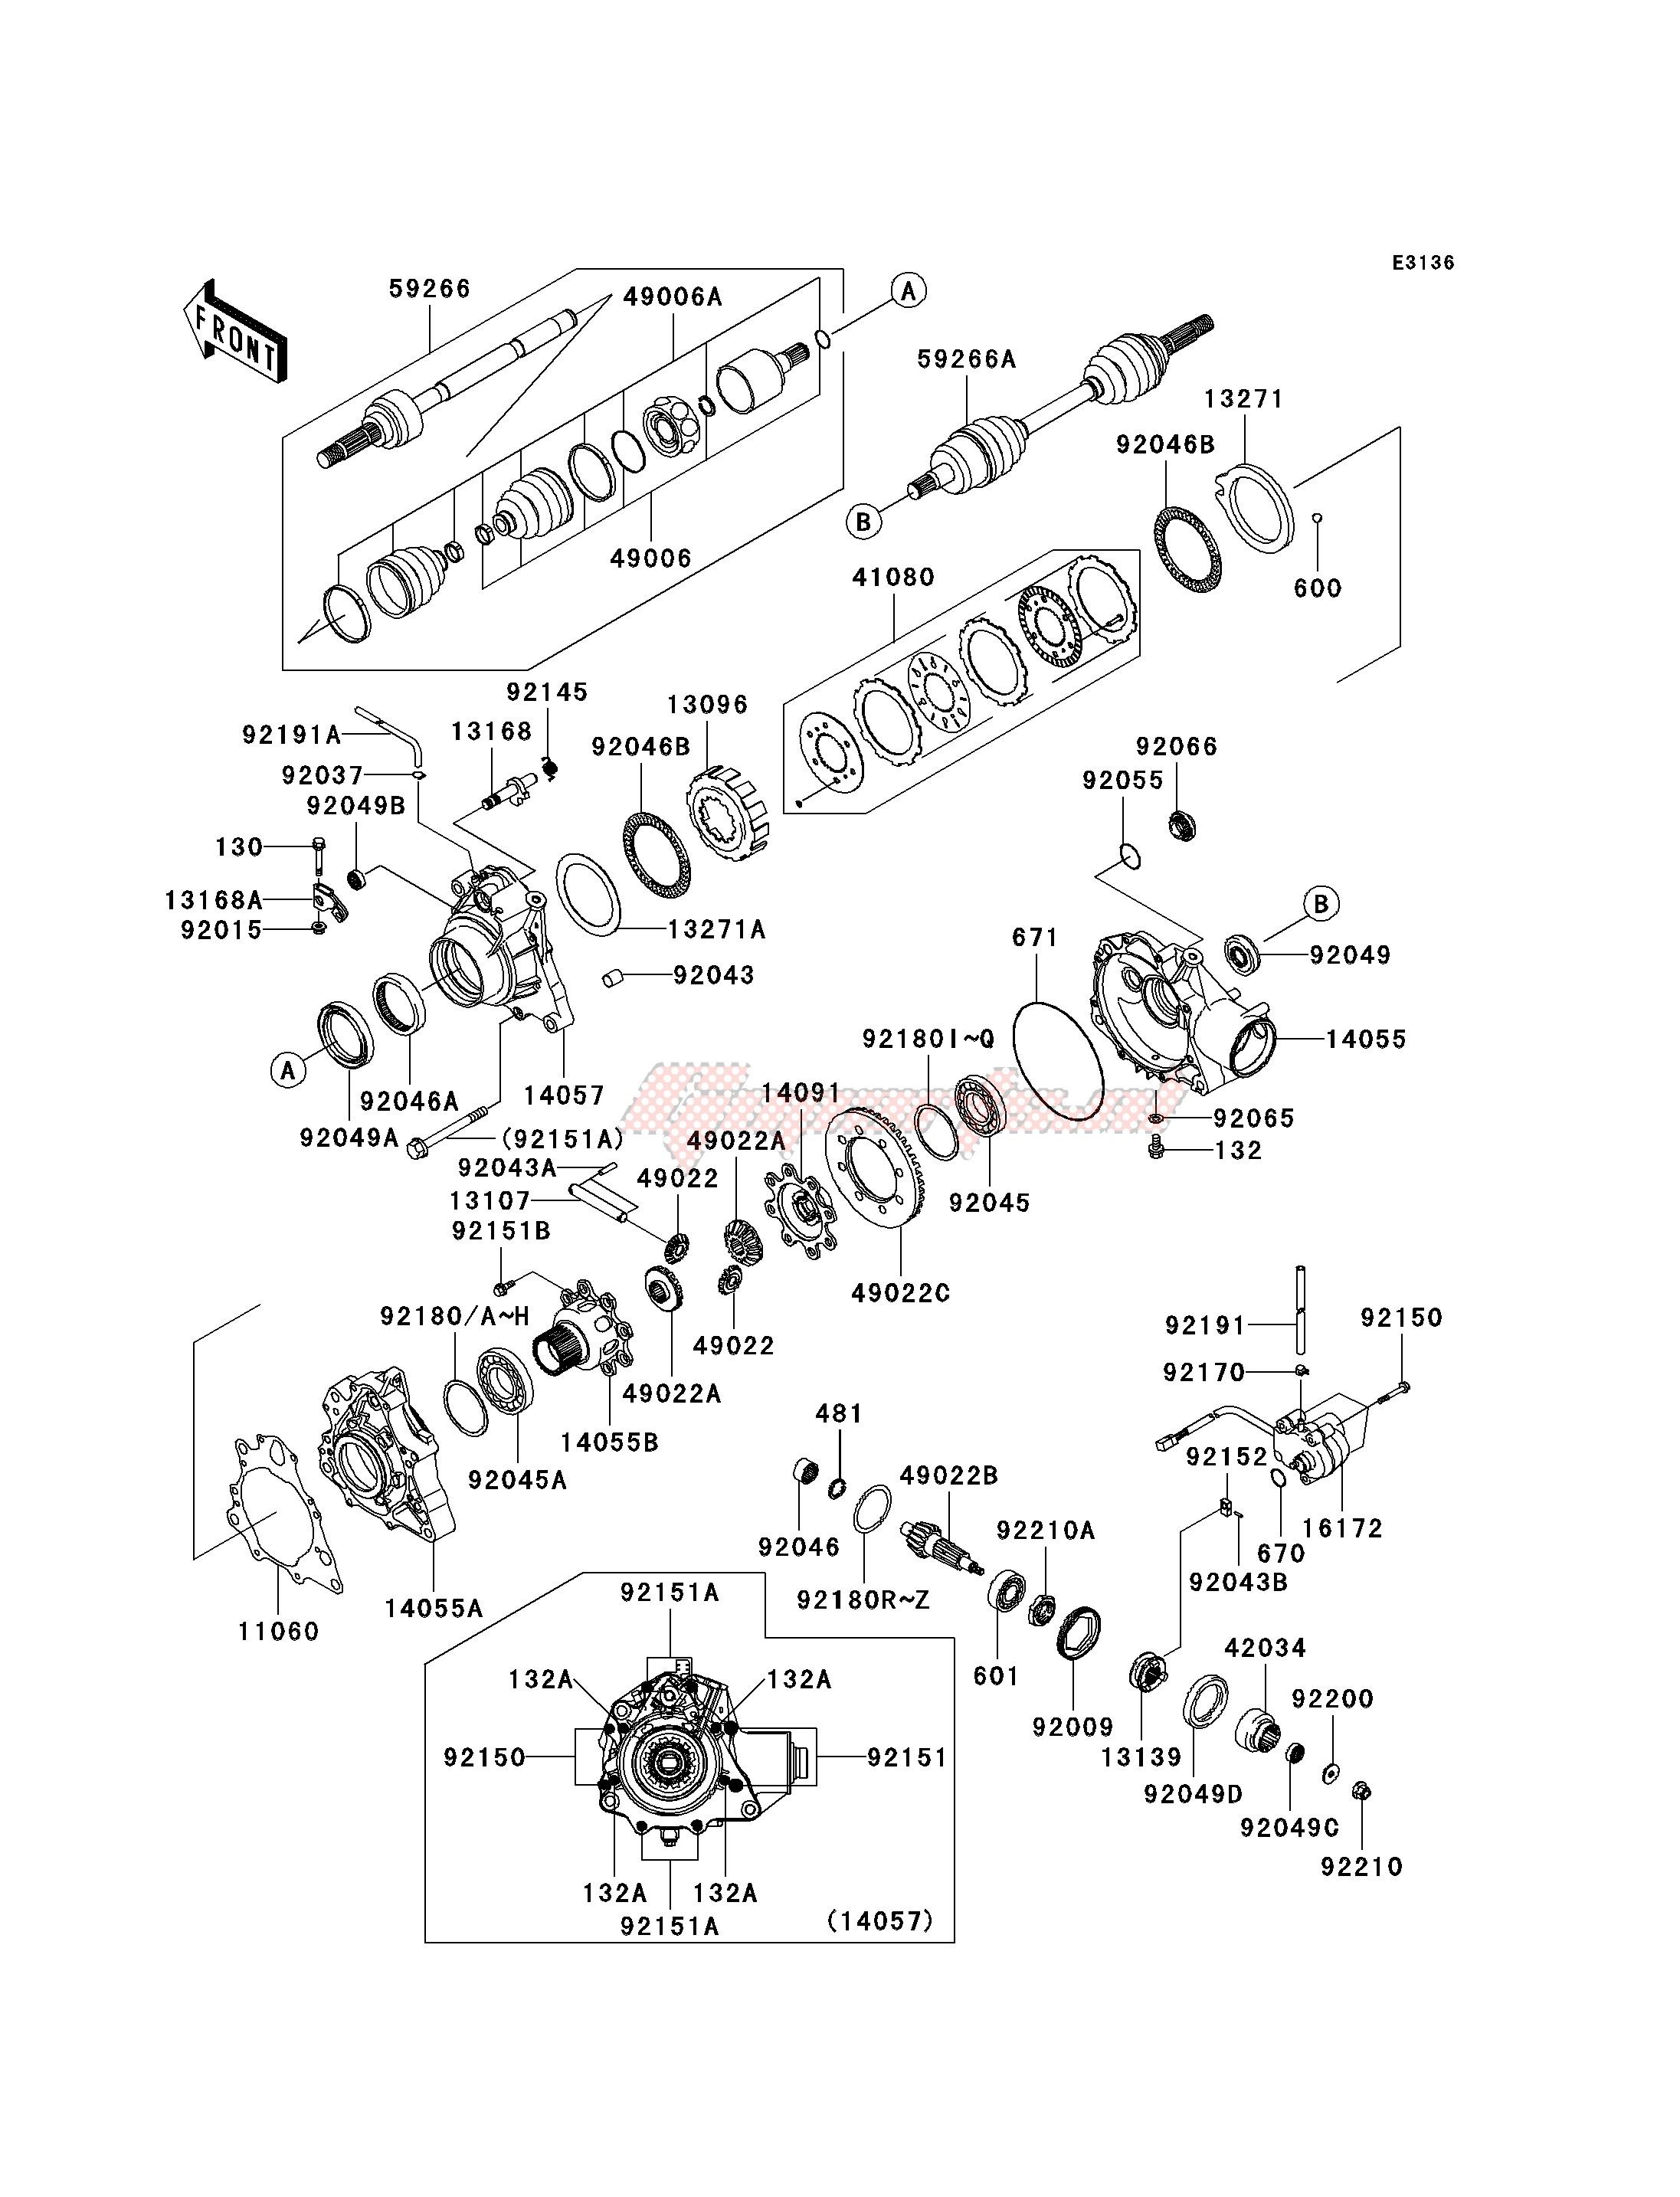 Accelerator Pedal Sensor Standard APS291 fits 07-09 Kia Sorento